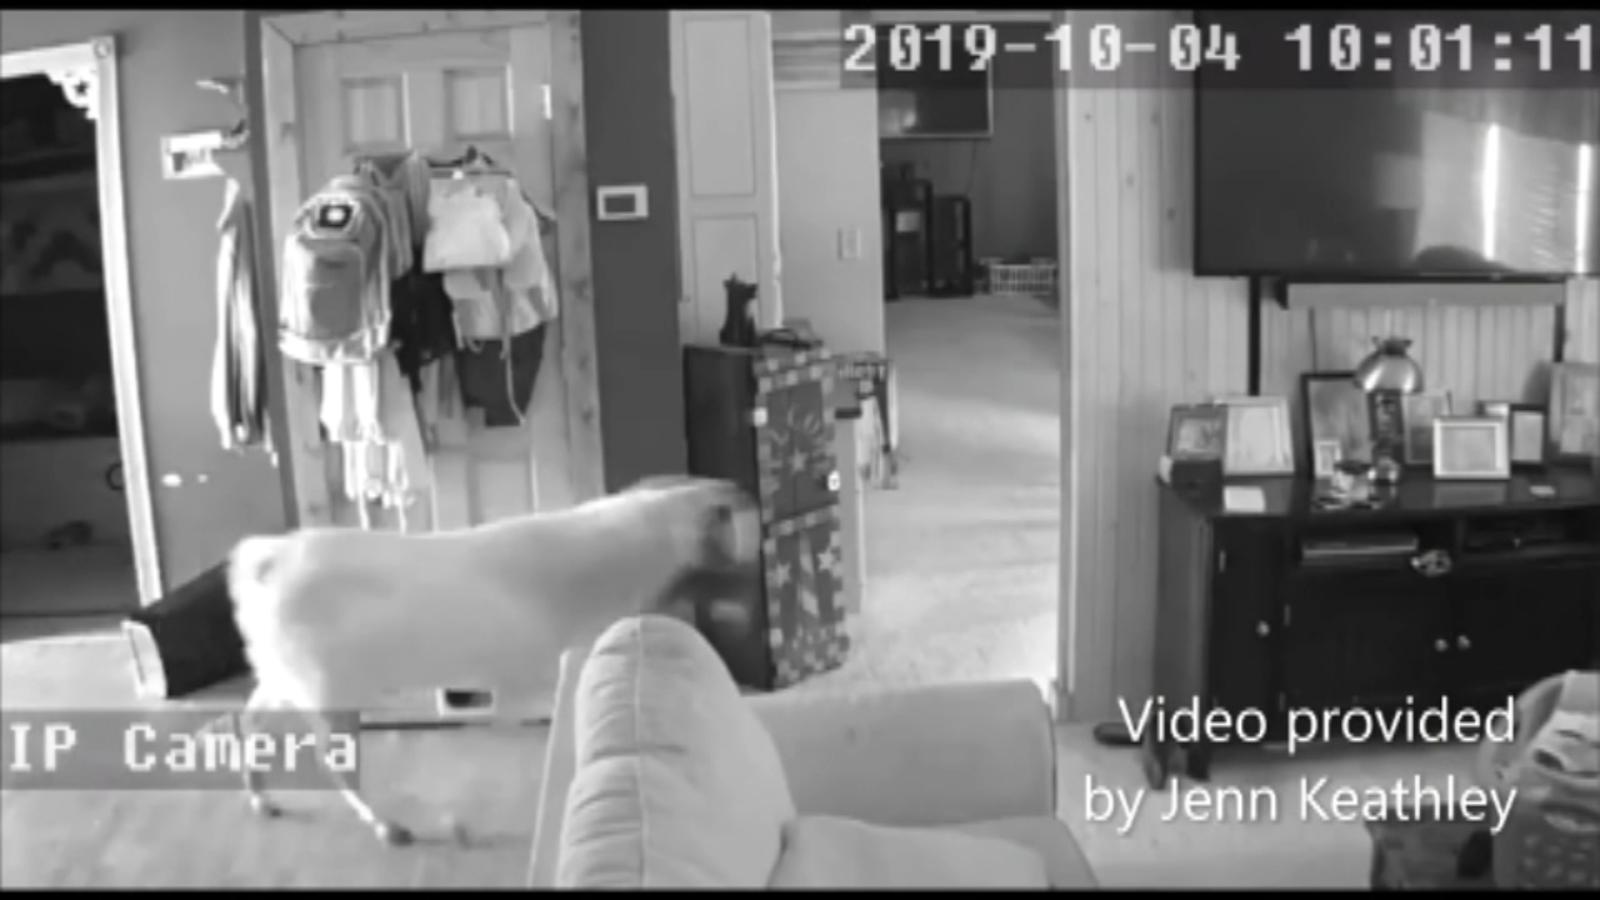 Teen finds goat intruder napping inside bathroom